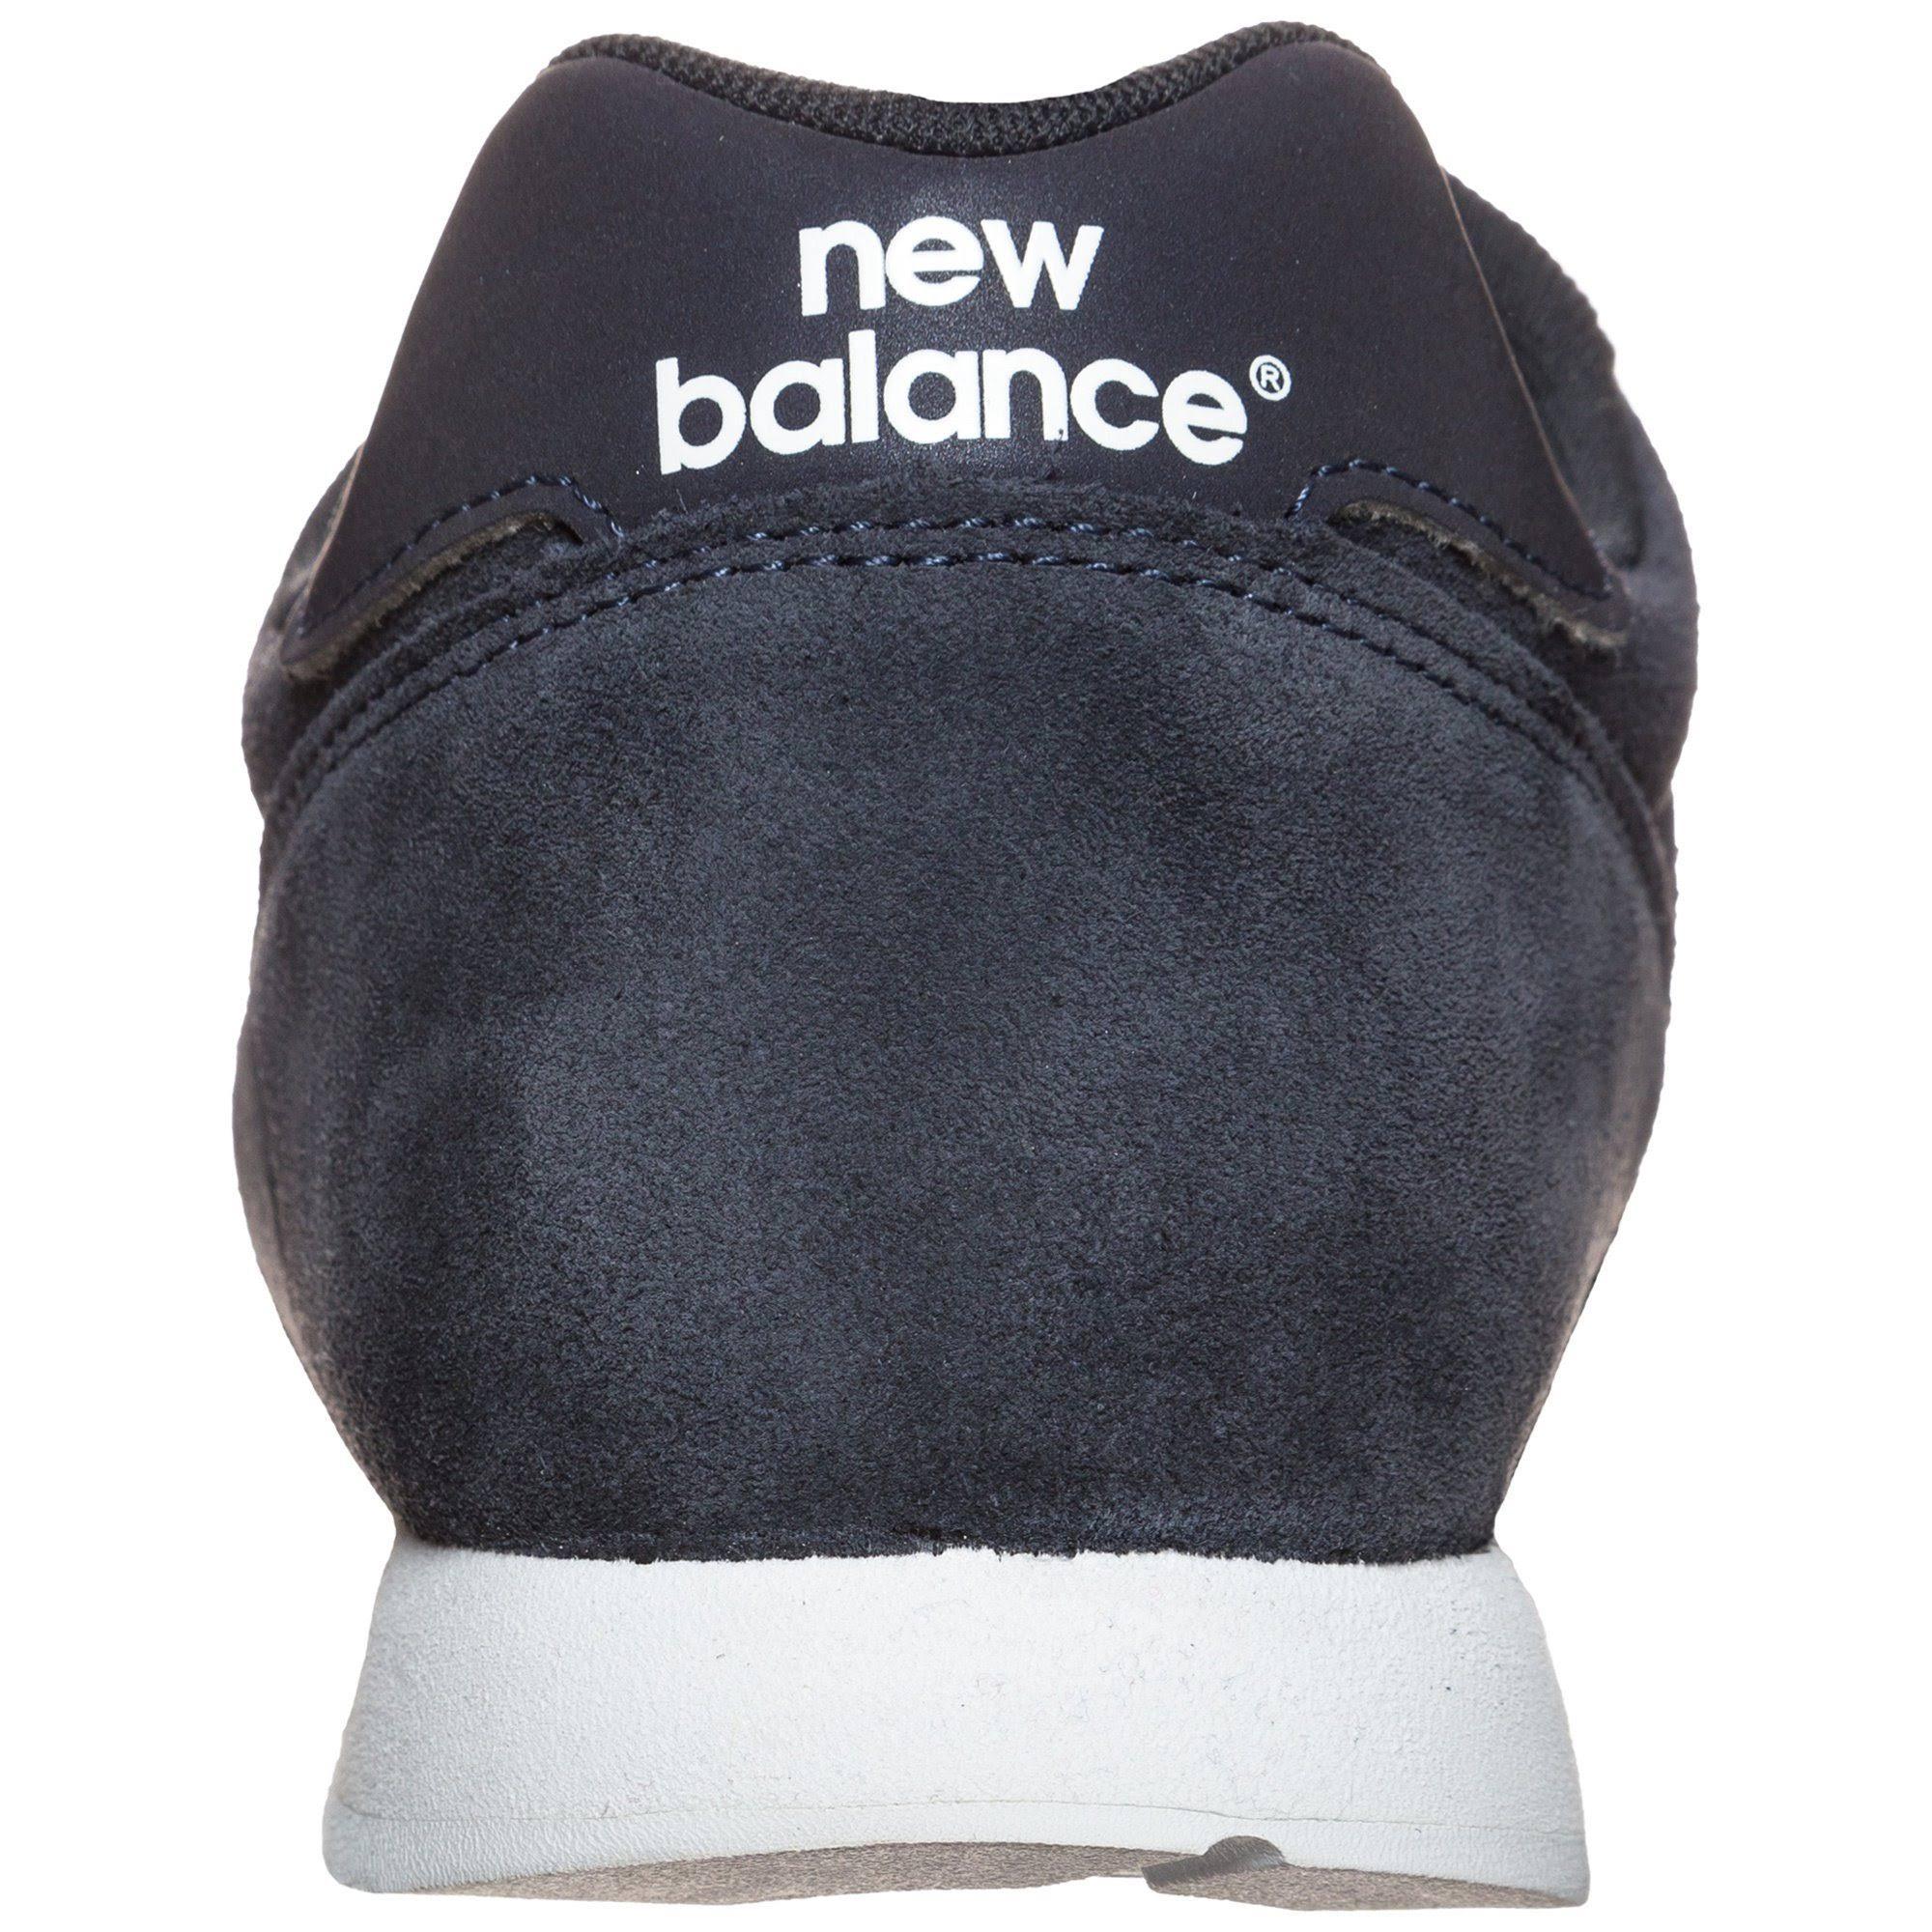 schwarz Blau 5 Sneaker Ml373tm Dunkelblau Balance Größe Herren New 41 Schuhe AvzqO